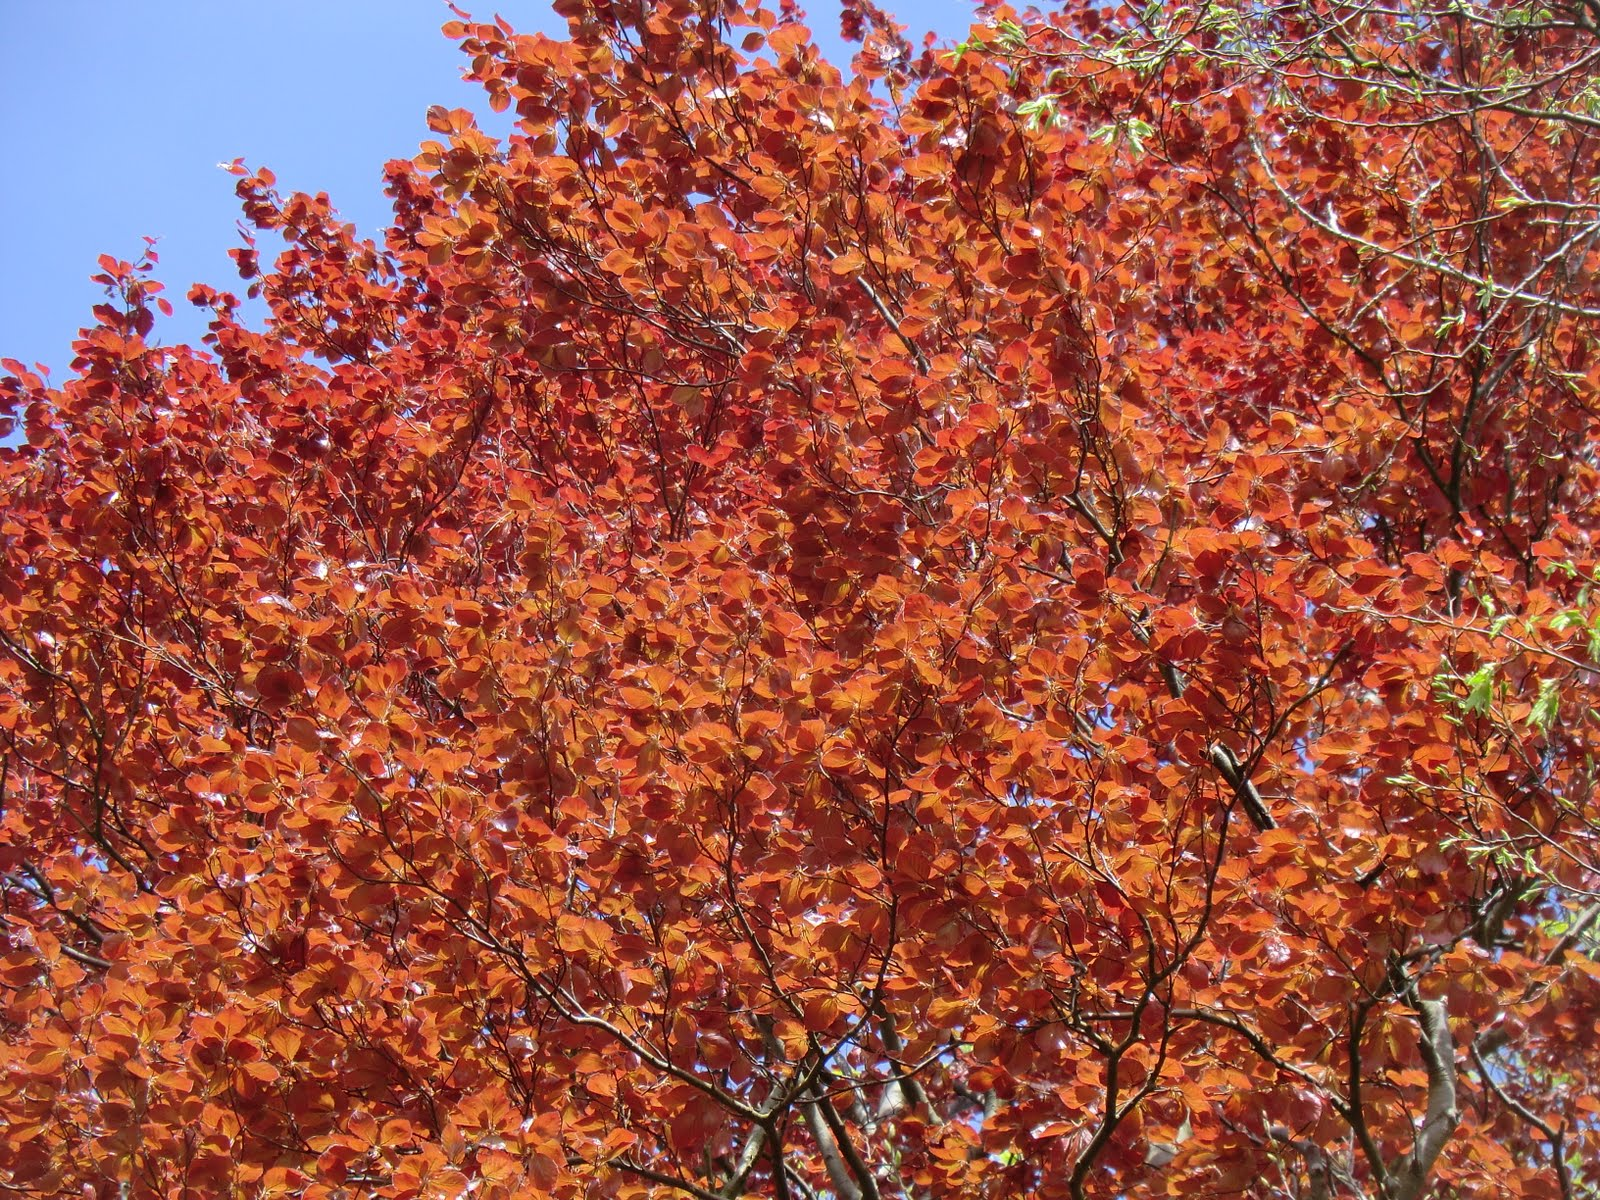 CIMG4210 Copper beech leaves, Selsdon Wood